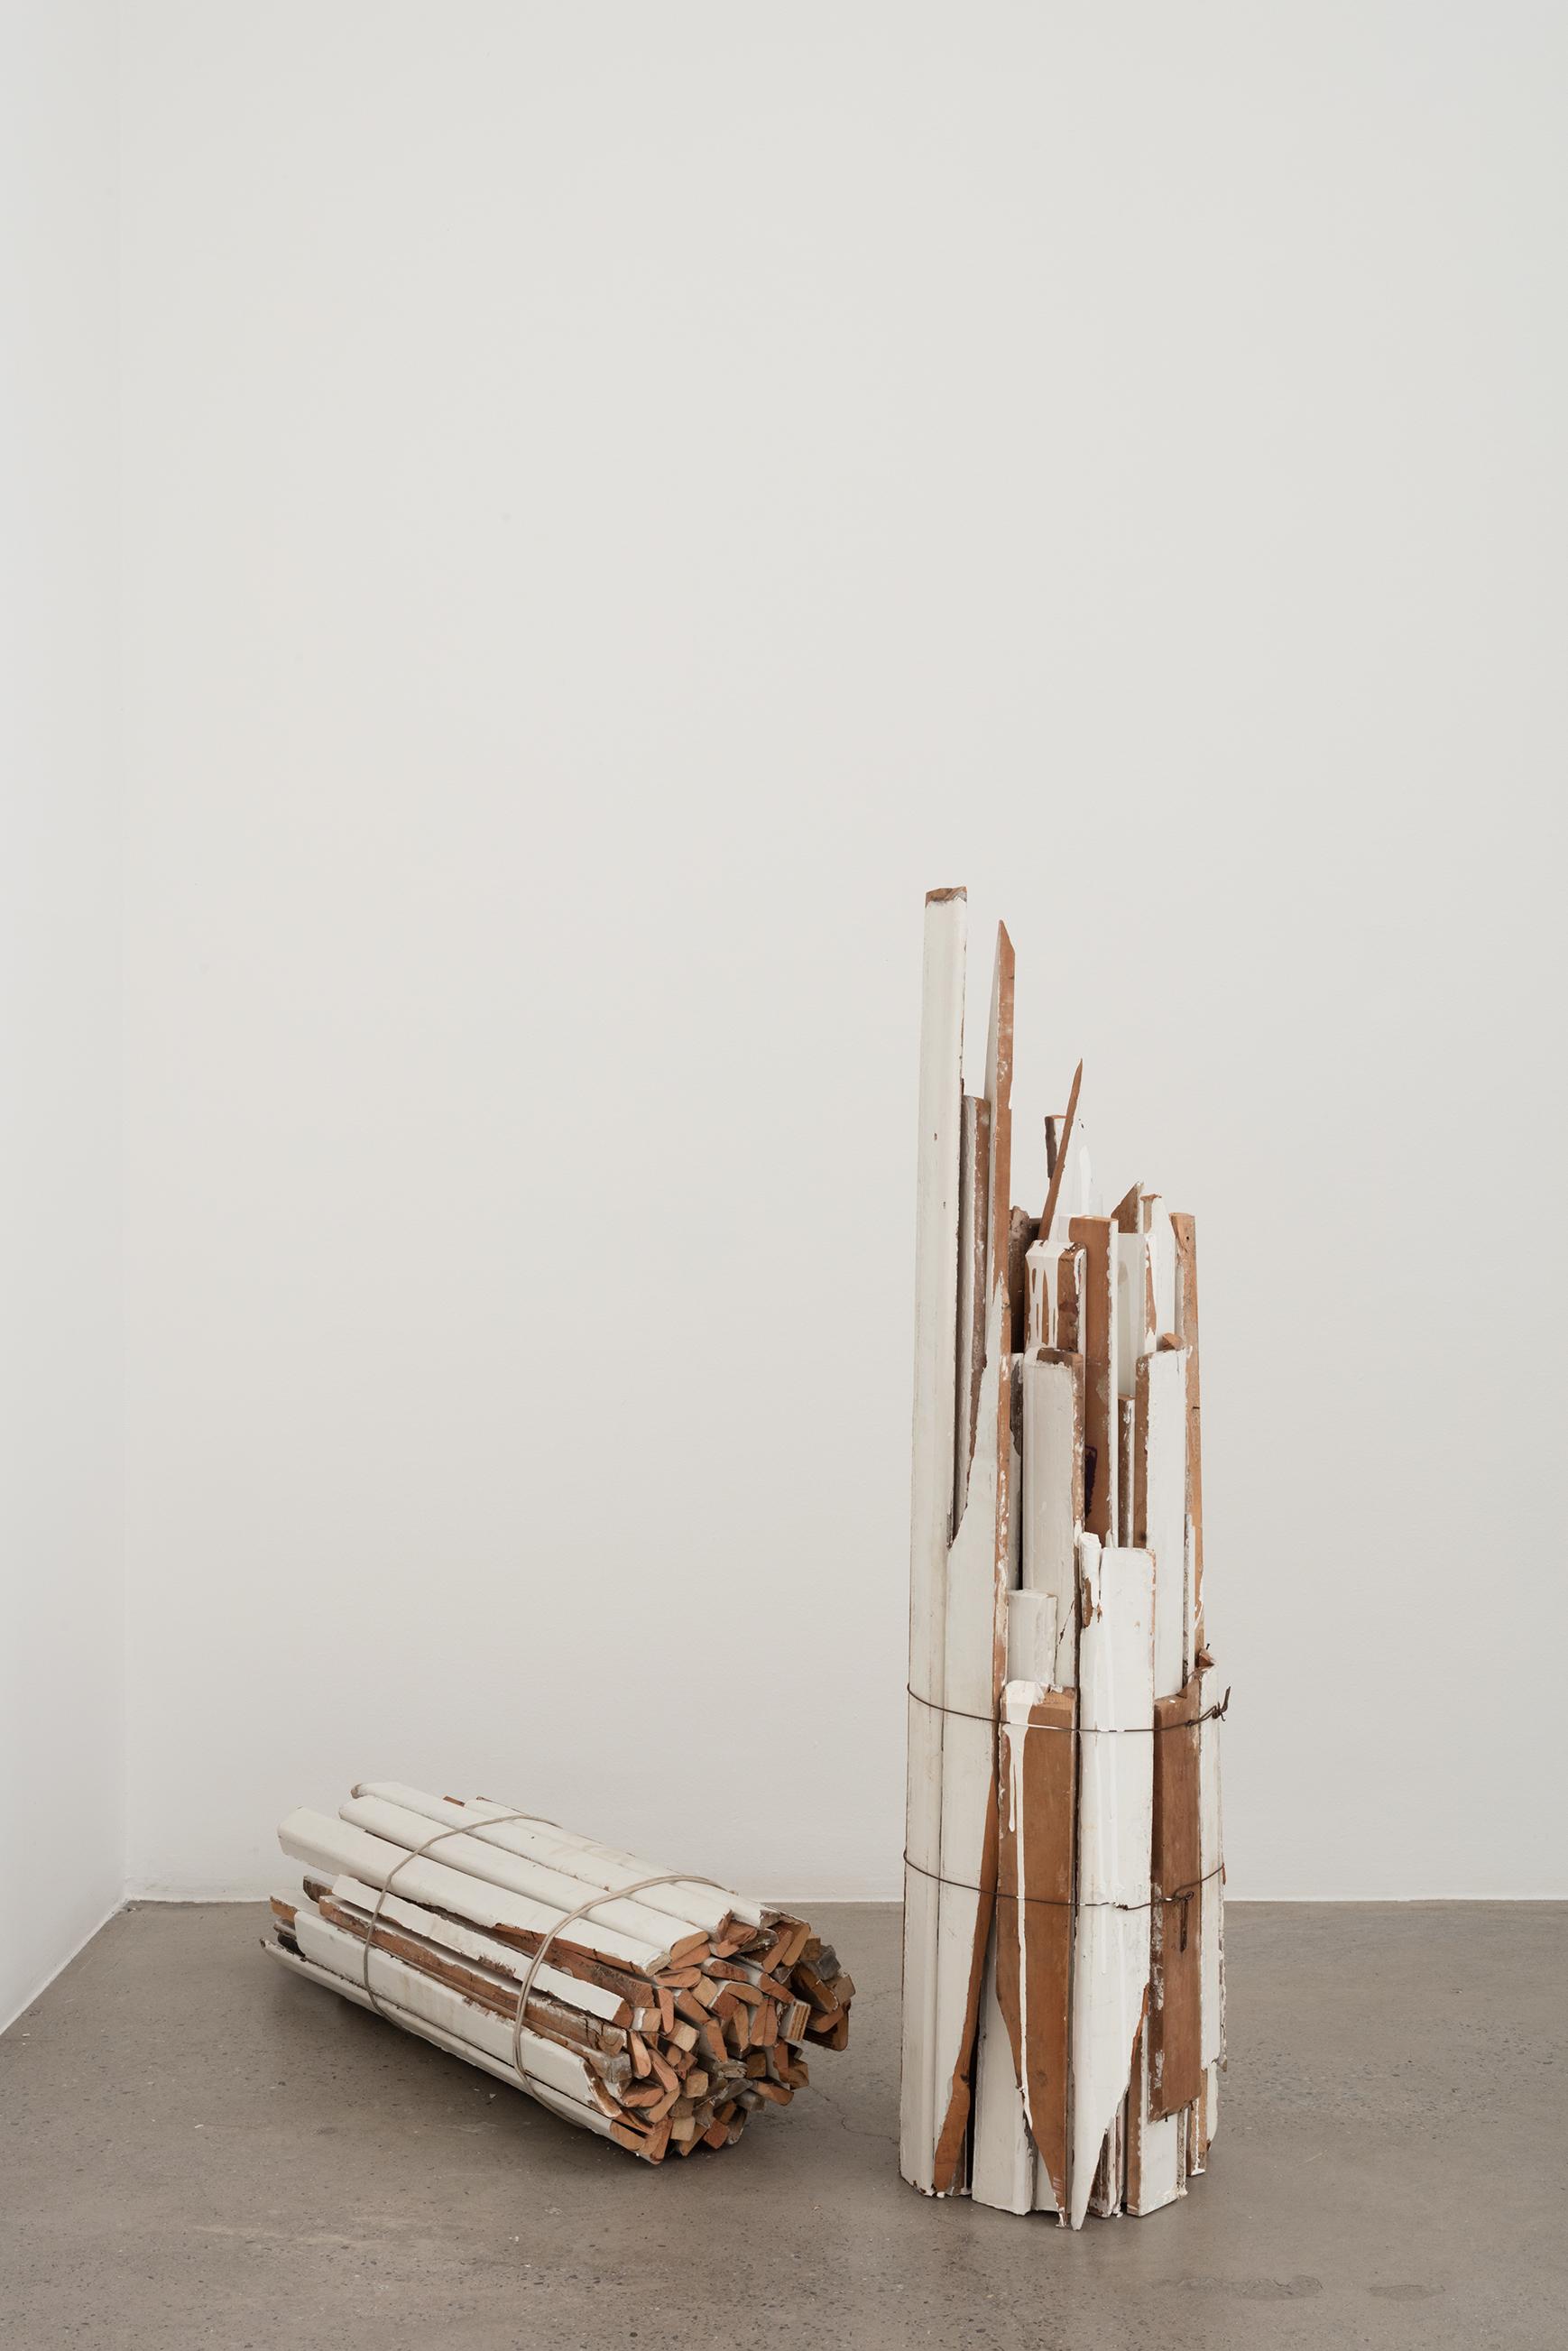 3. Untitled, Fernanda Gomes, 2016. Galeria Luisa Strina, São Paulo. Image: Pat Kilgore. Courtesy of Galeria Luisa Strina.